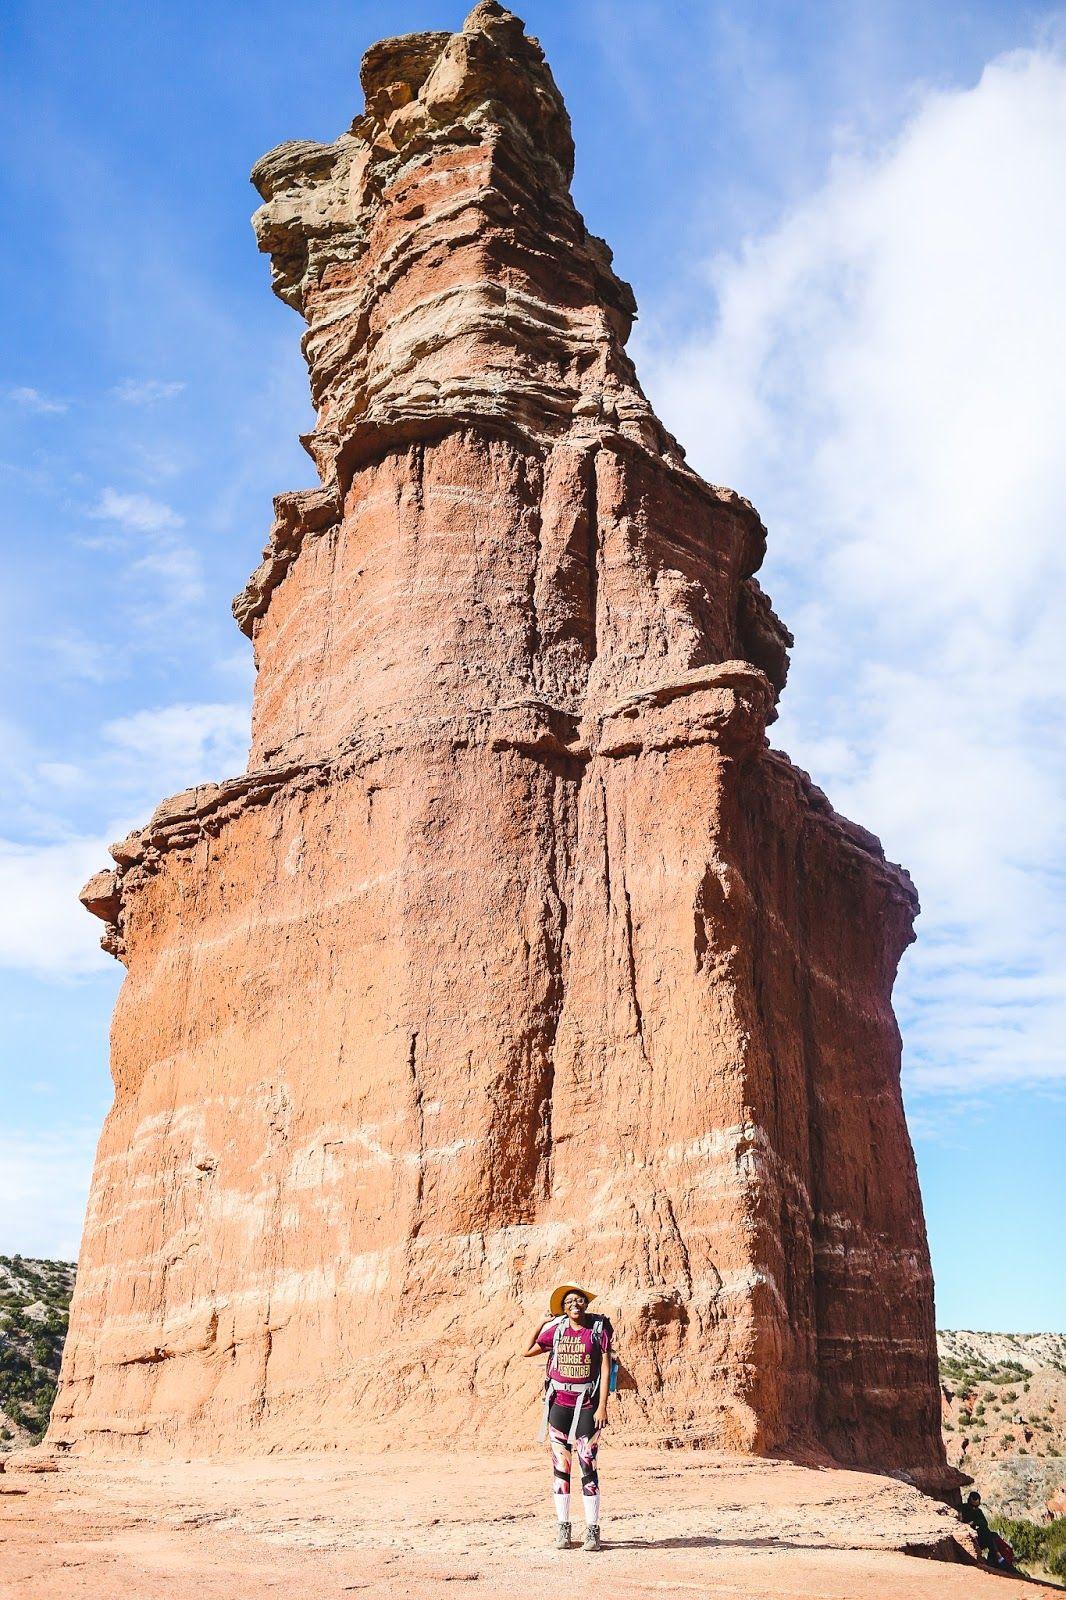 Travel Guide: Hiking Palo Duro Canyon | Palo duro canyon ...